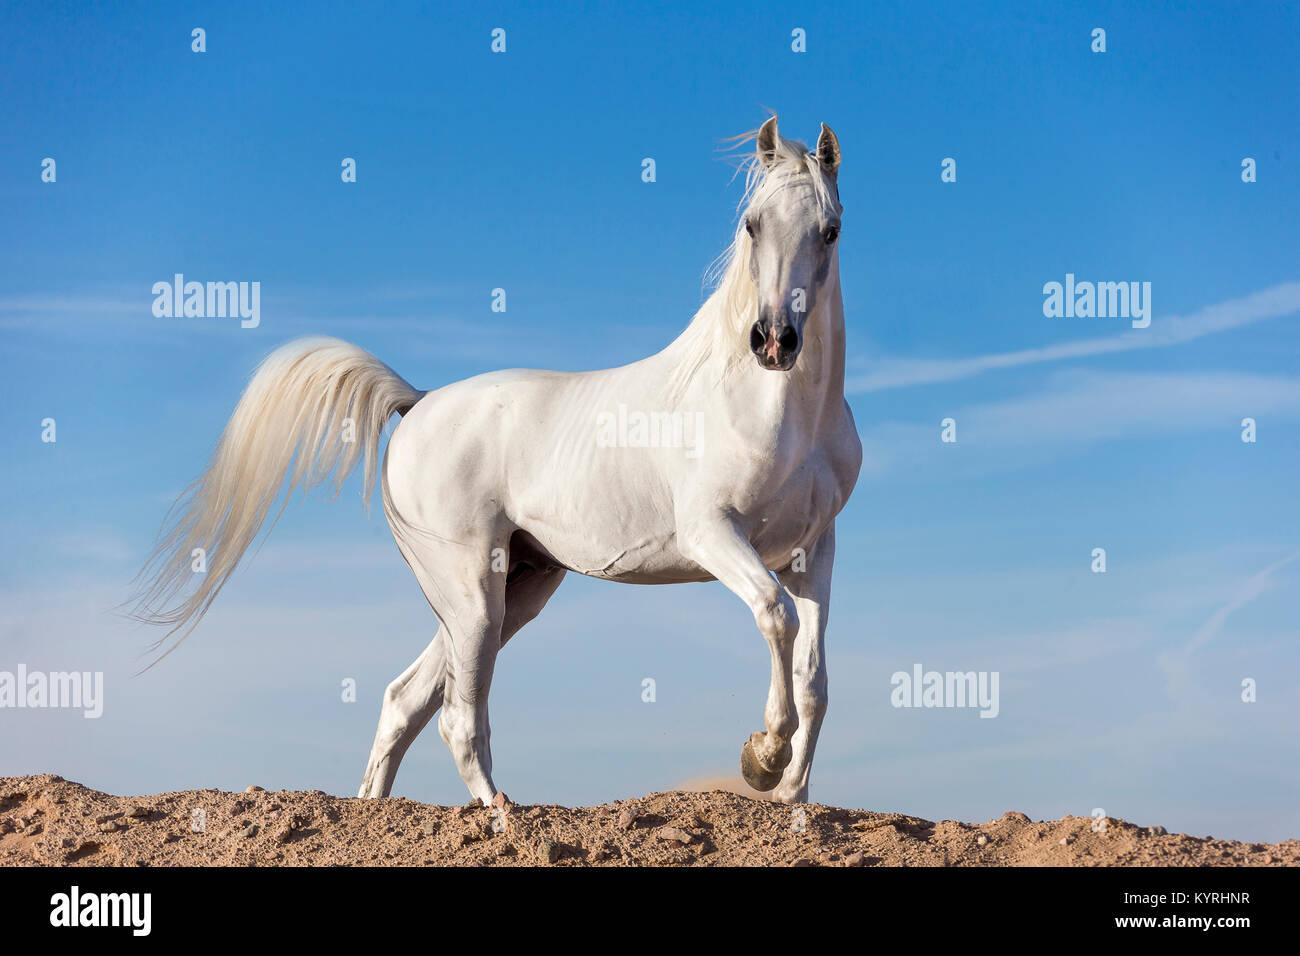 Arabian Horse. Gray stallion walking on a dune. Egypt. Stock Photo